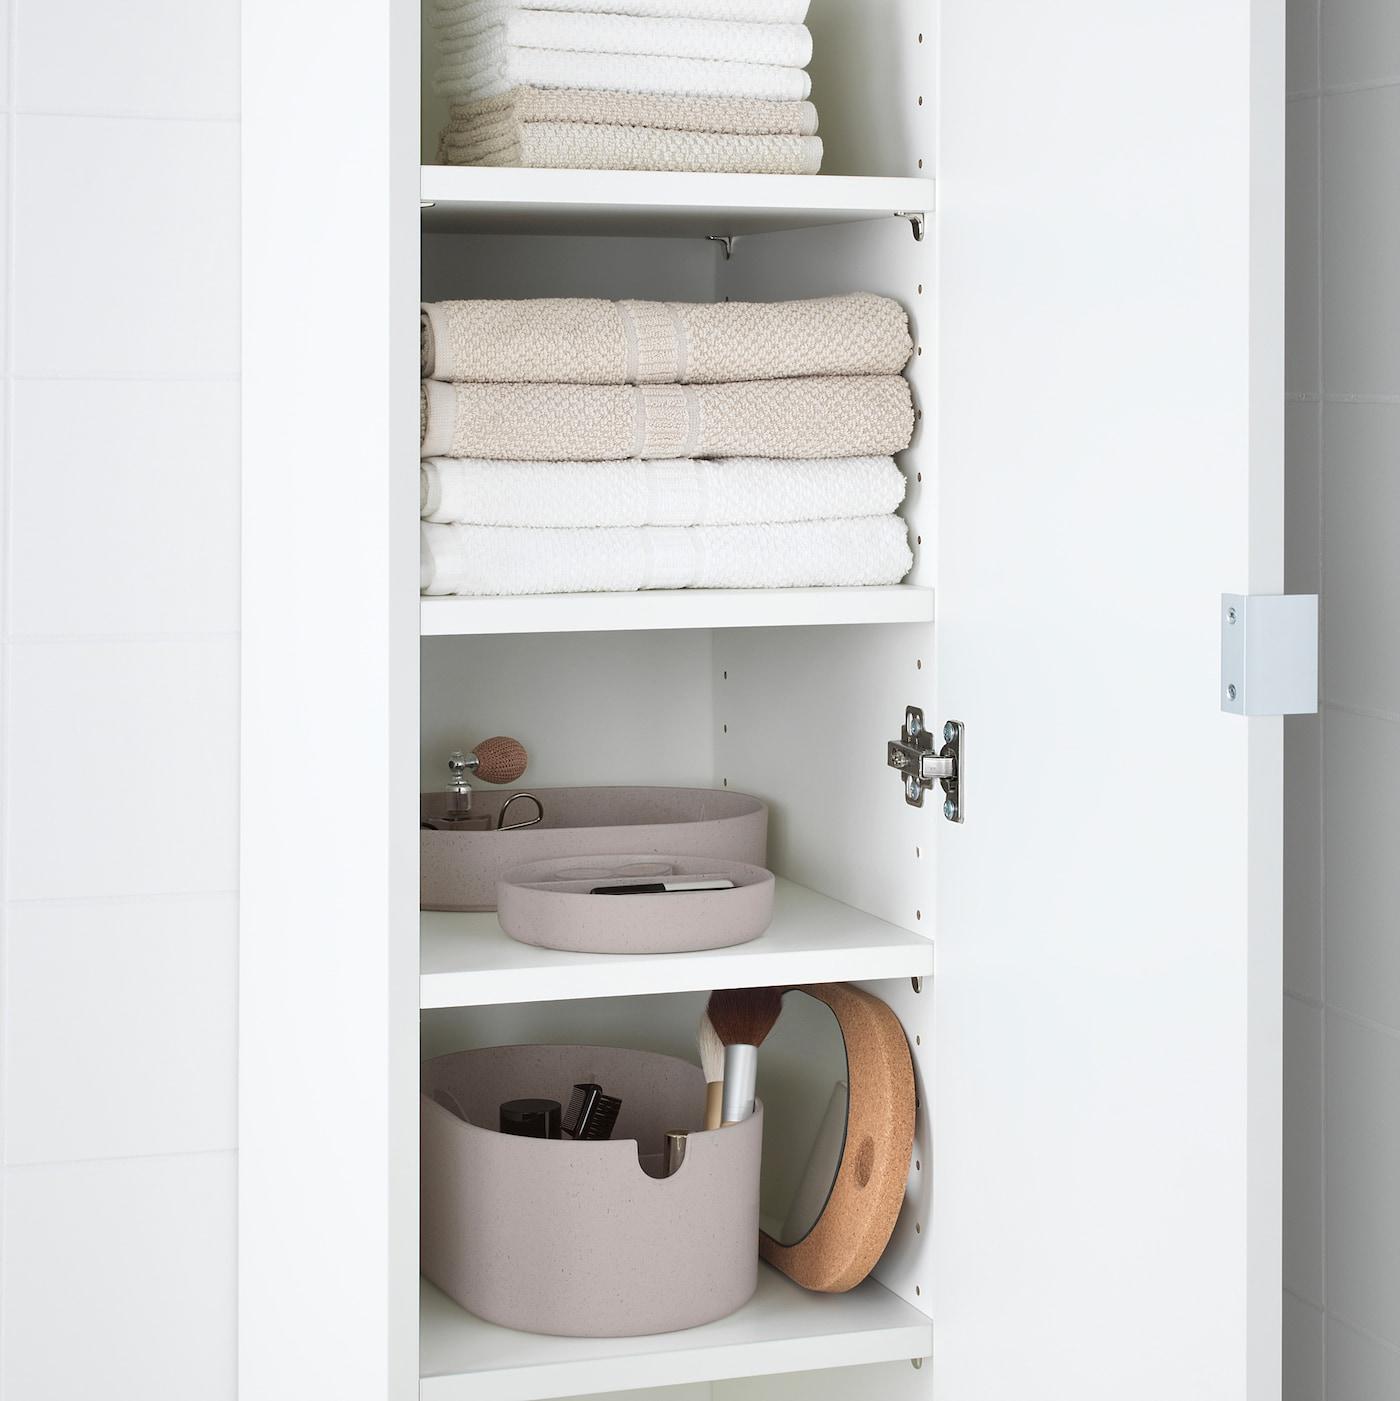 Saxborga Storage Box With Mirrored Lid Plastic Cork 9 X6 Ikea